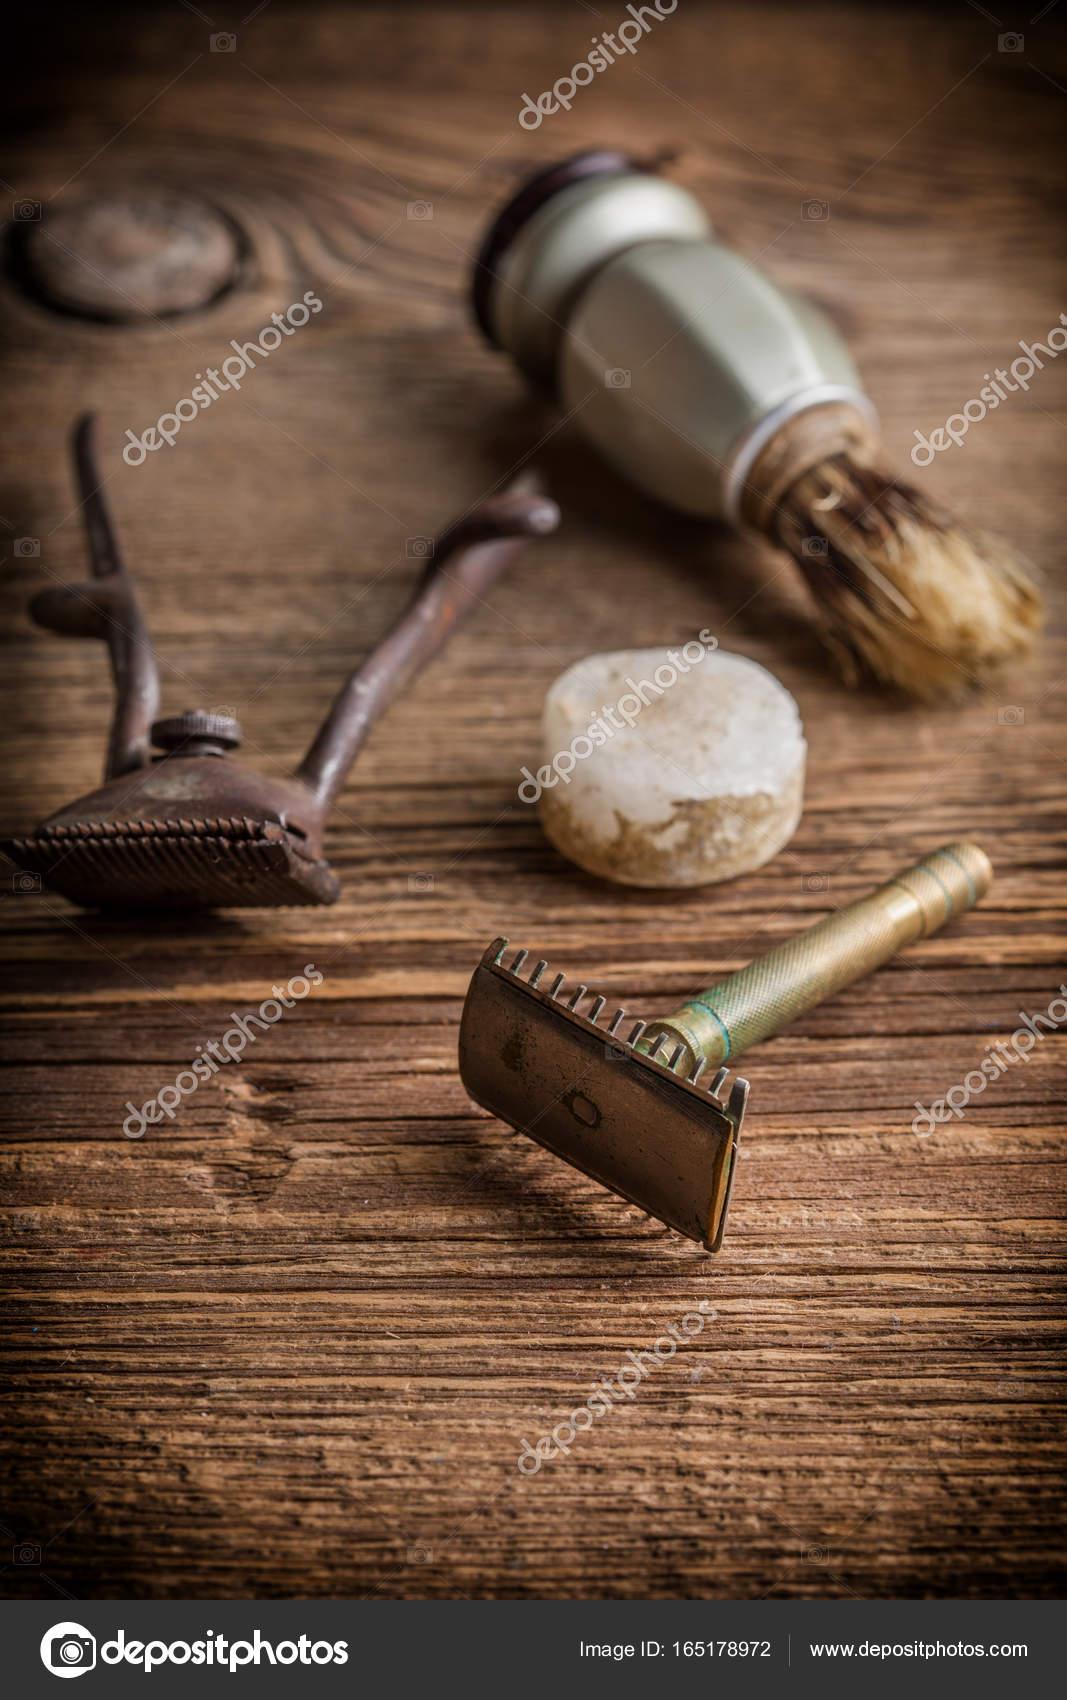 https fr depositphotos com 165178972 stock photo vintage barber shop tools html